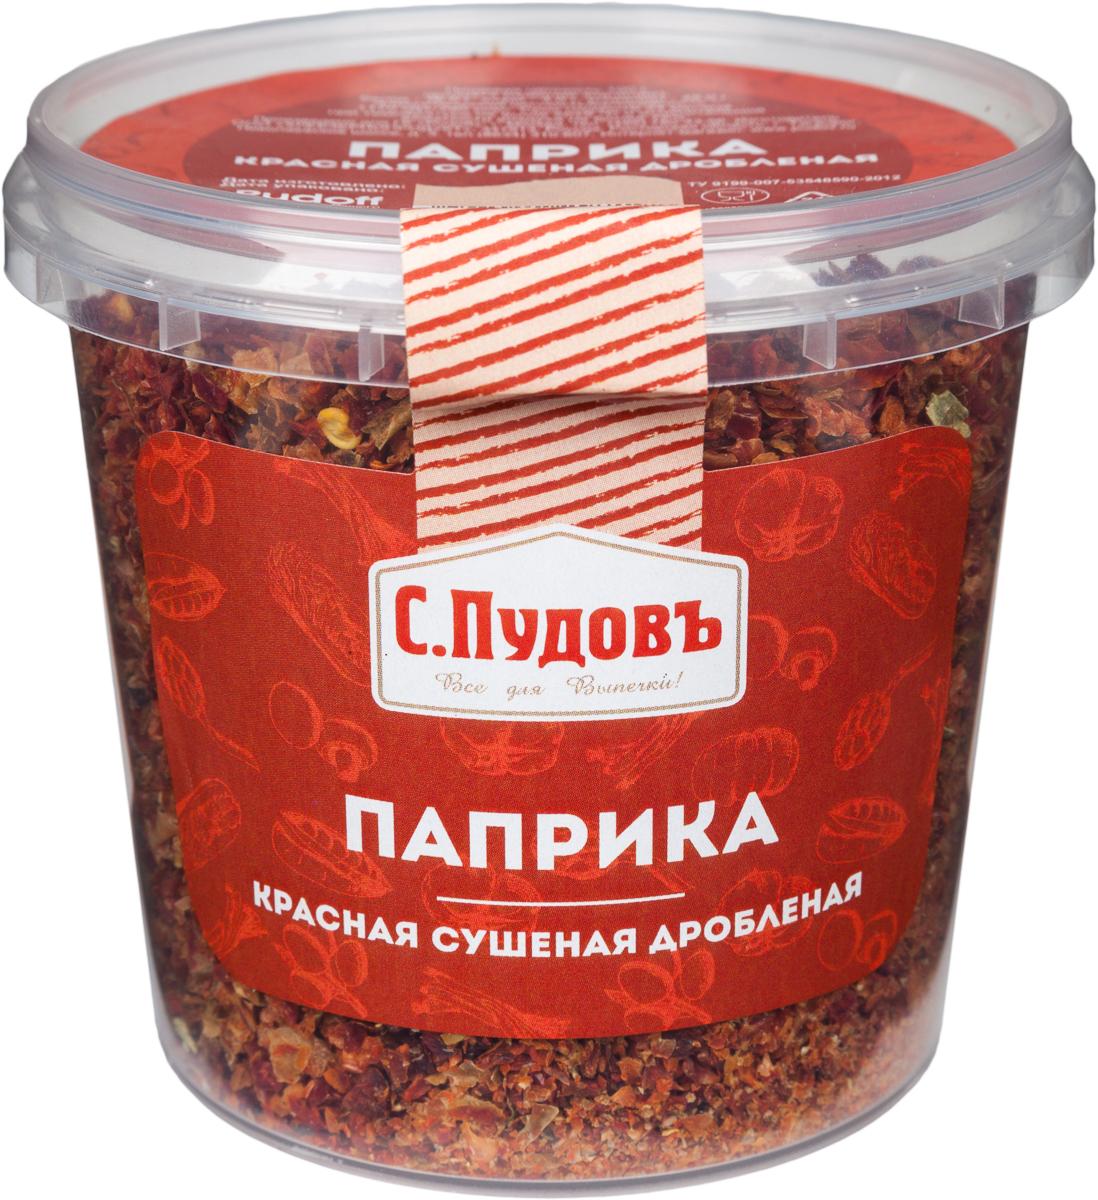 Пудовъ паприка красная сушеная дробленая, 100 г паприка красная сушёная 50 г китай